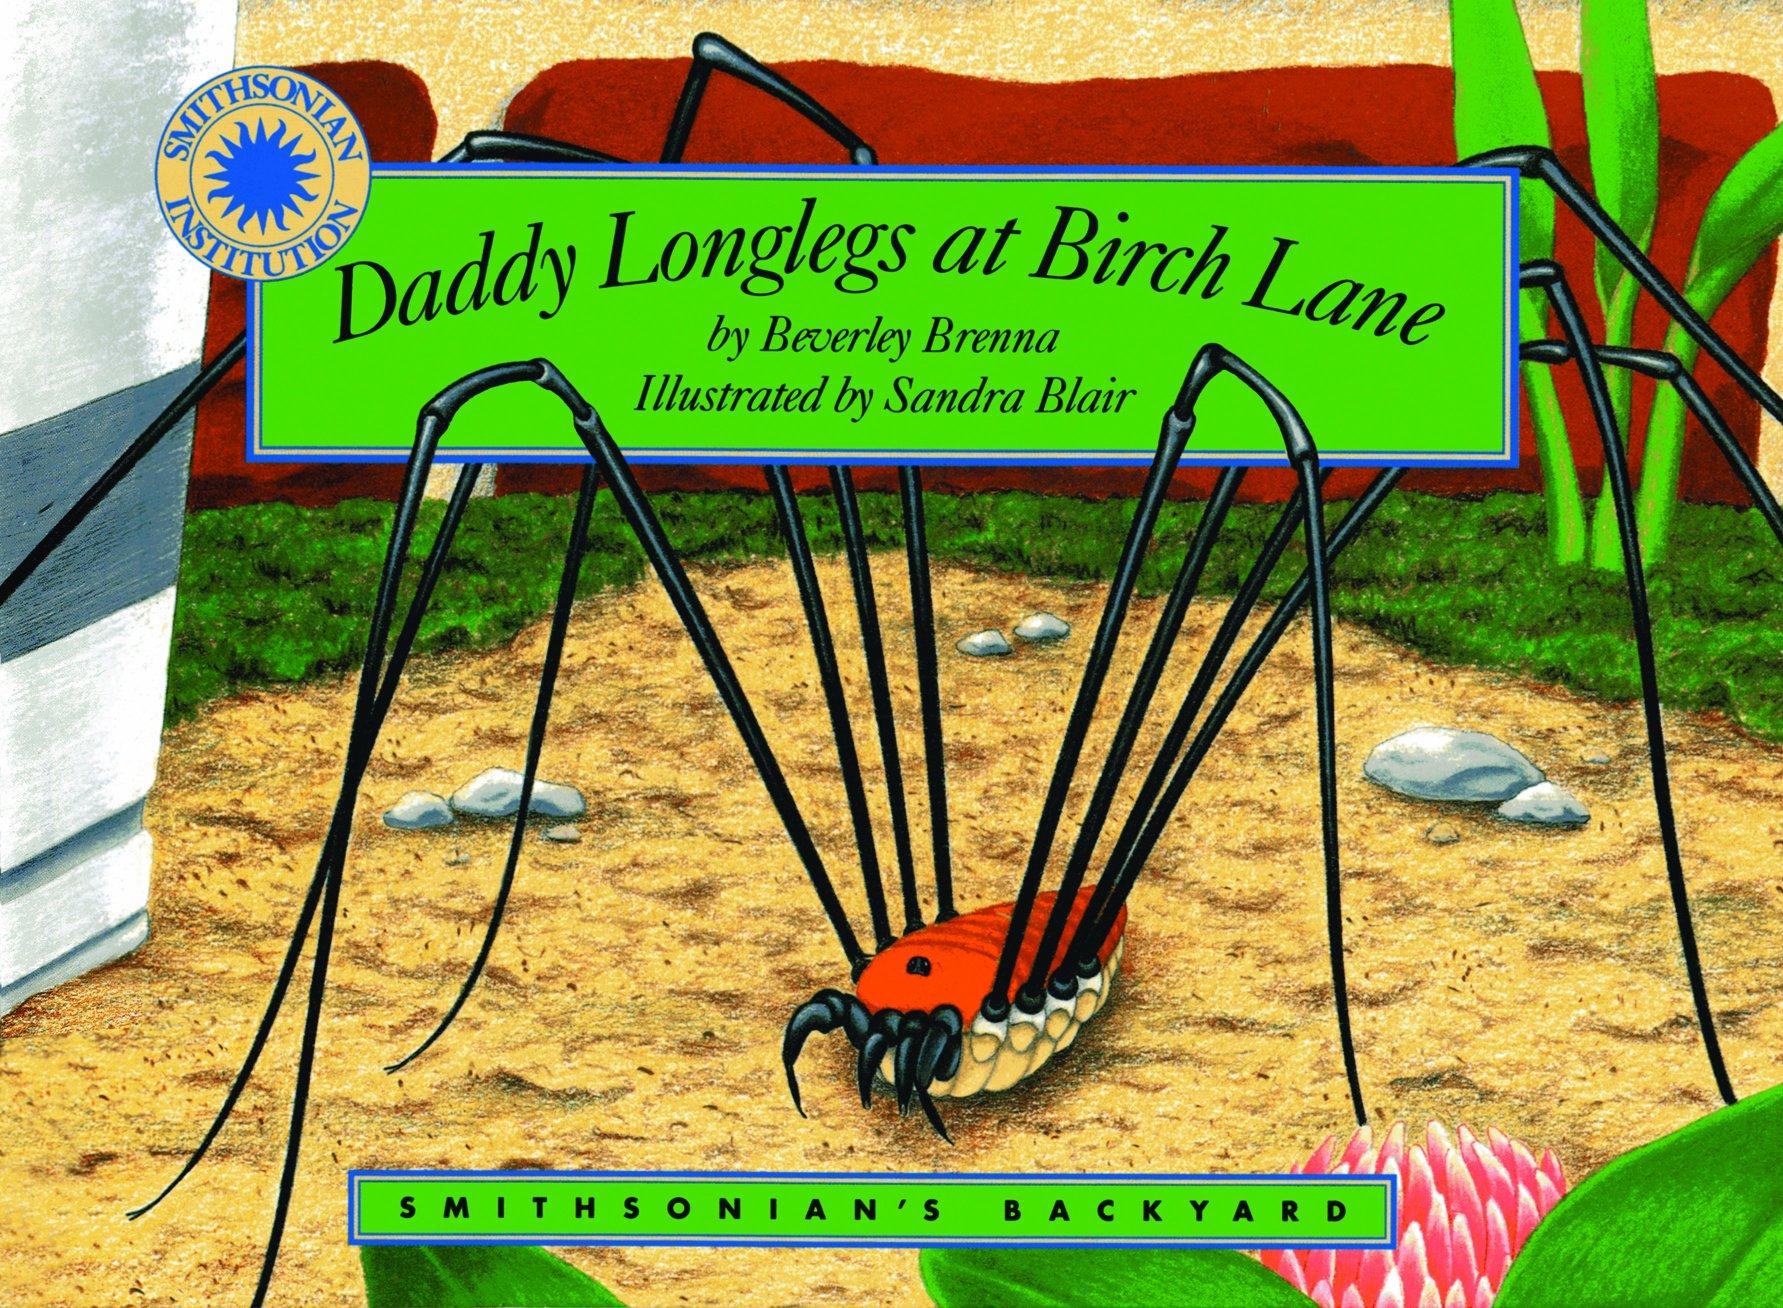 Daddy Longlegs at Birch Lane - a Smithsonian's Backyard Book